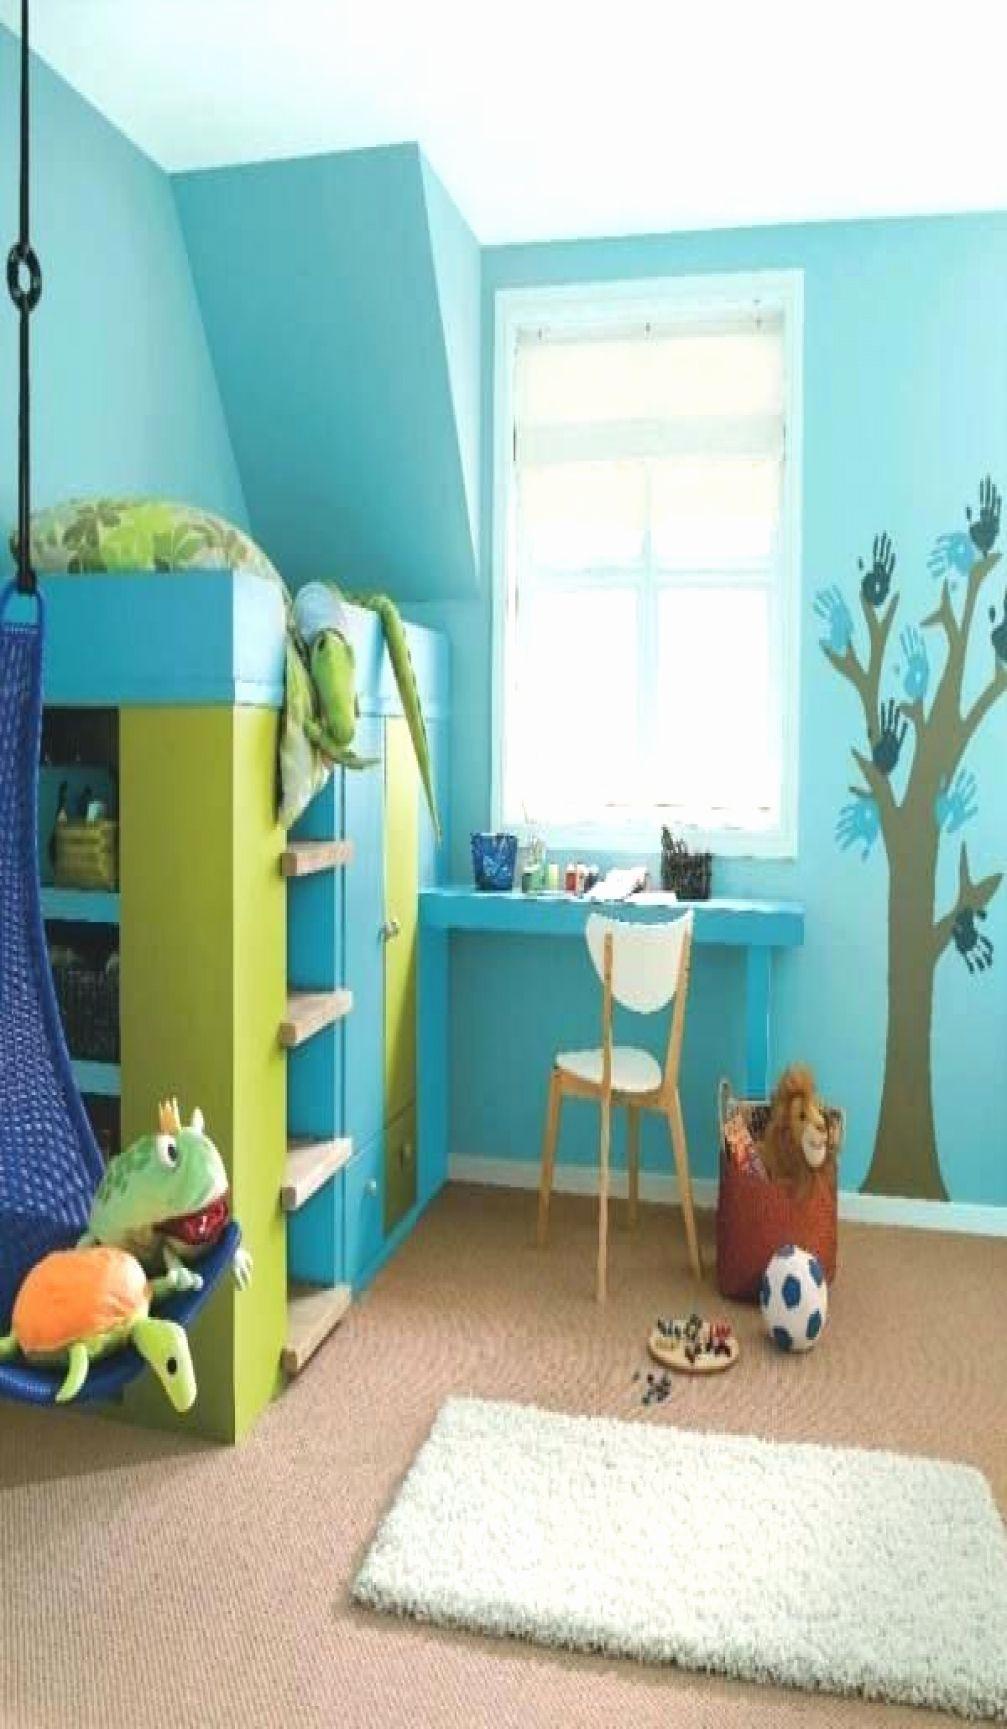 Idee Deco Chambre Garcon 4 Ans Chambre Enfant 10 Ans Idee Deco